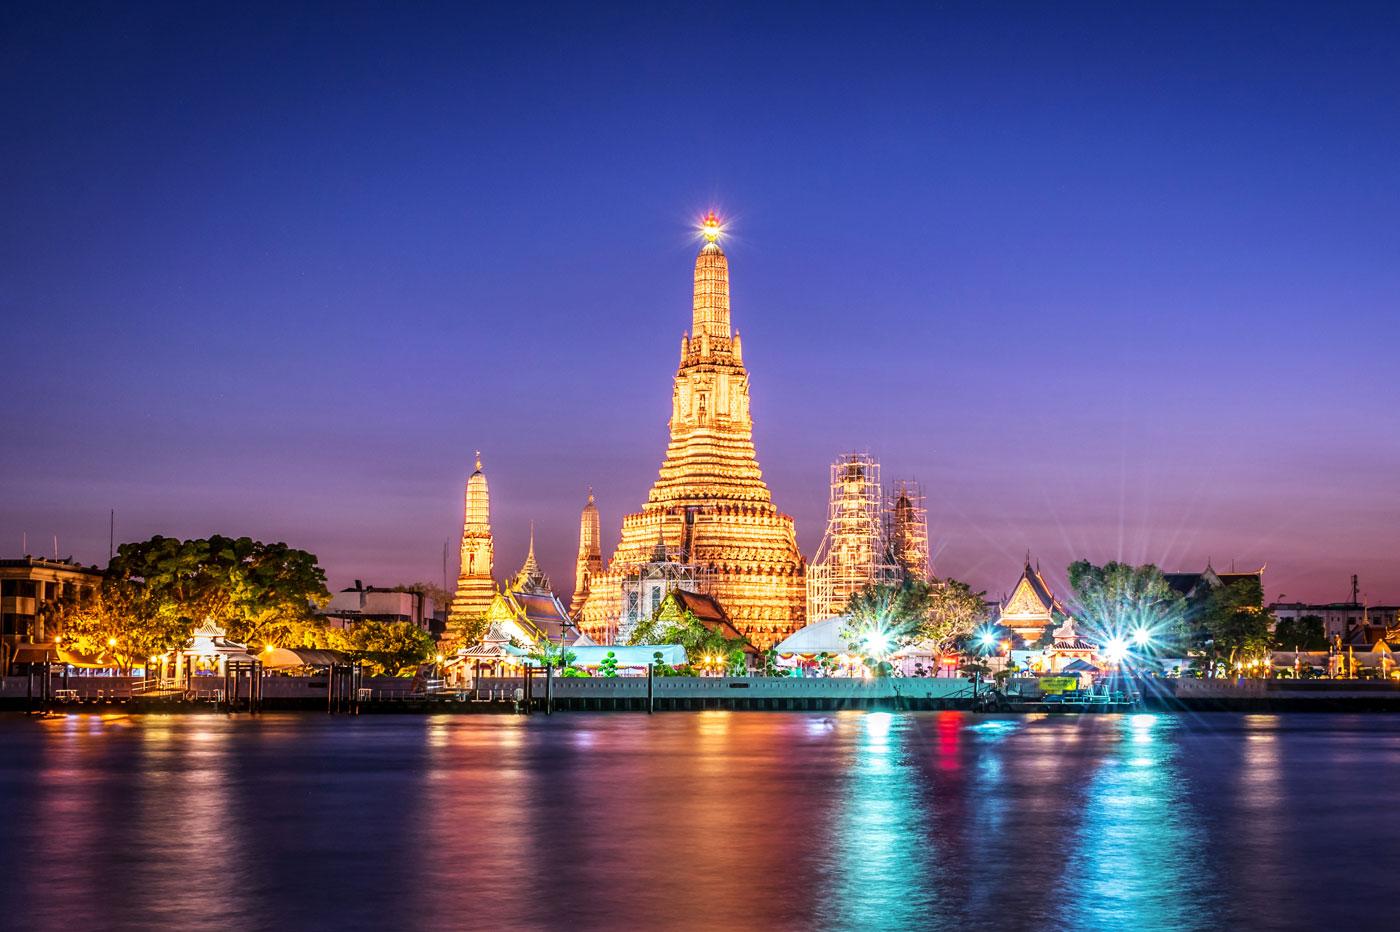 wat arun in bangkok - جاذبه های دیدنی و گردشگری تایلند (قسمت ۱) | Thailand